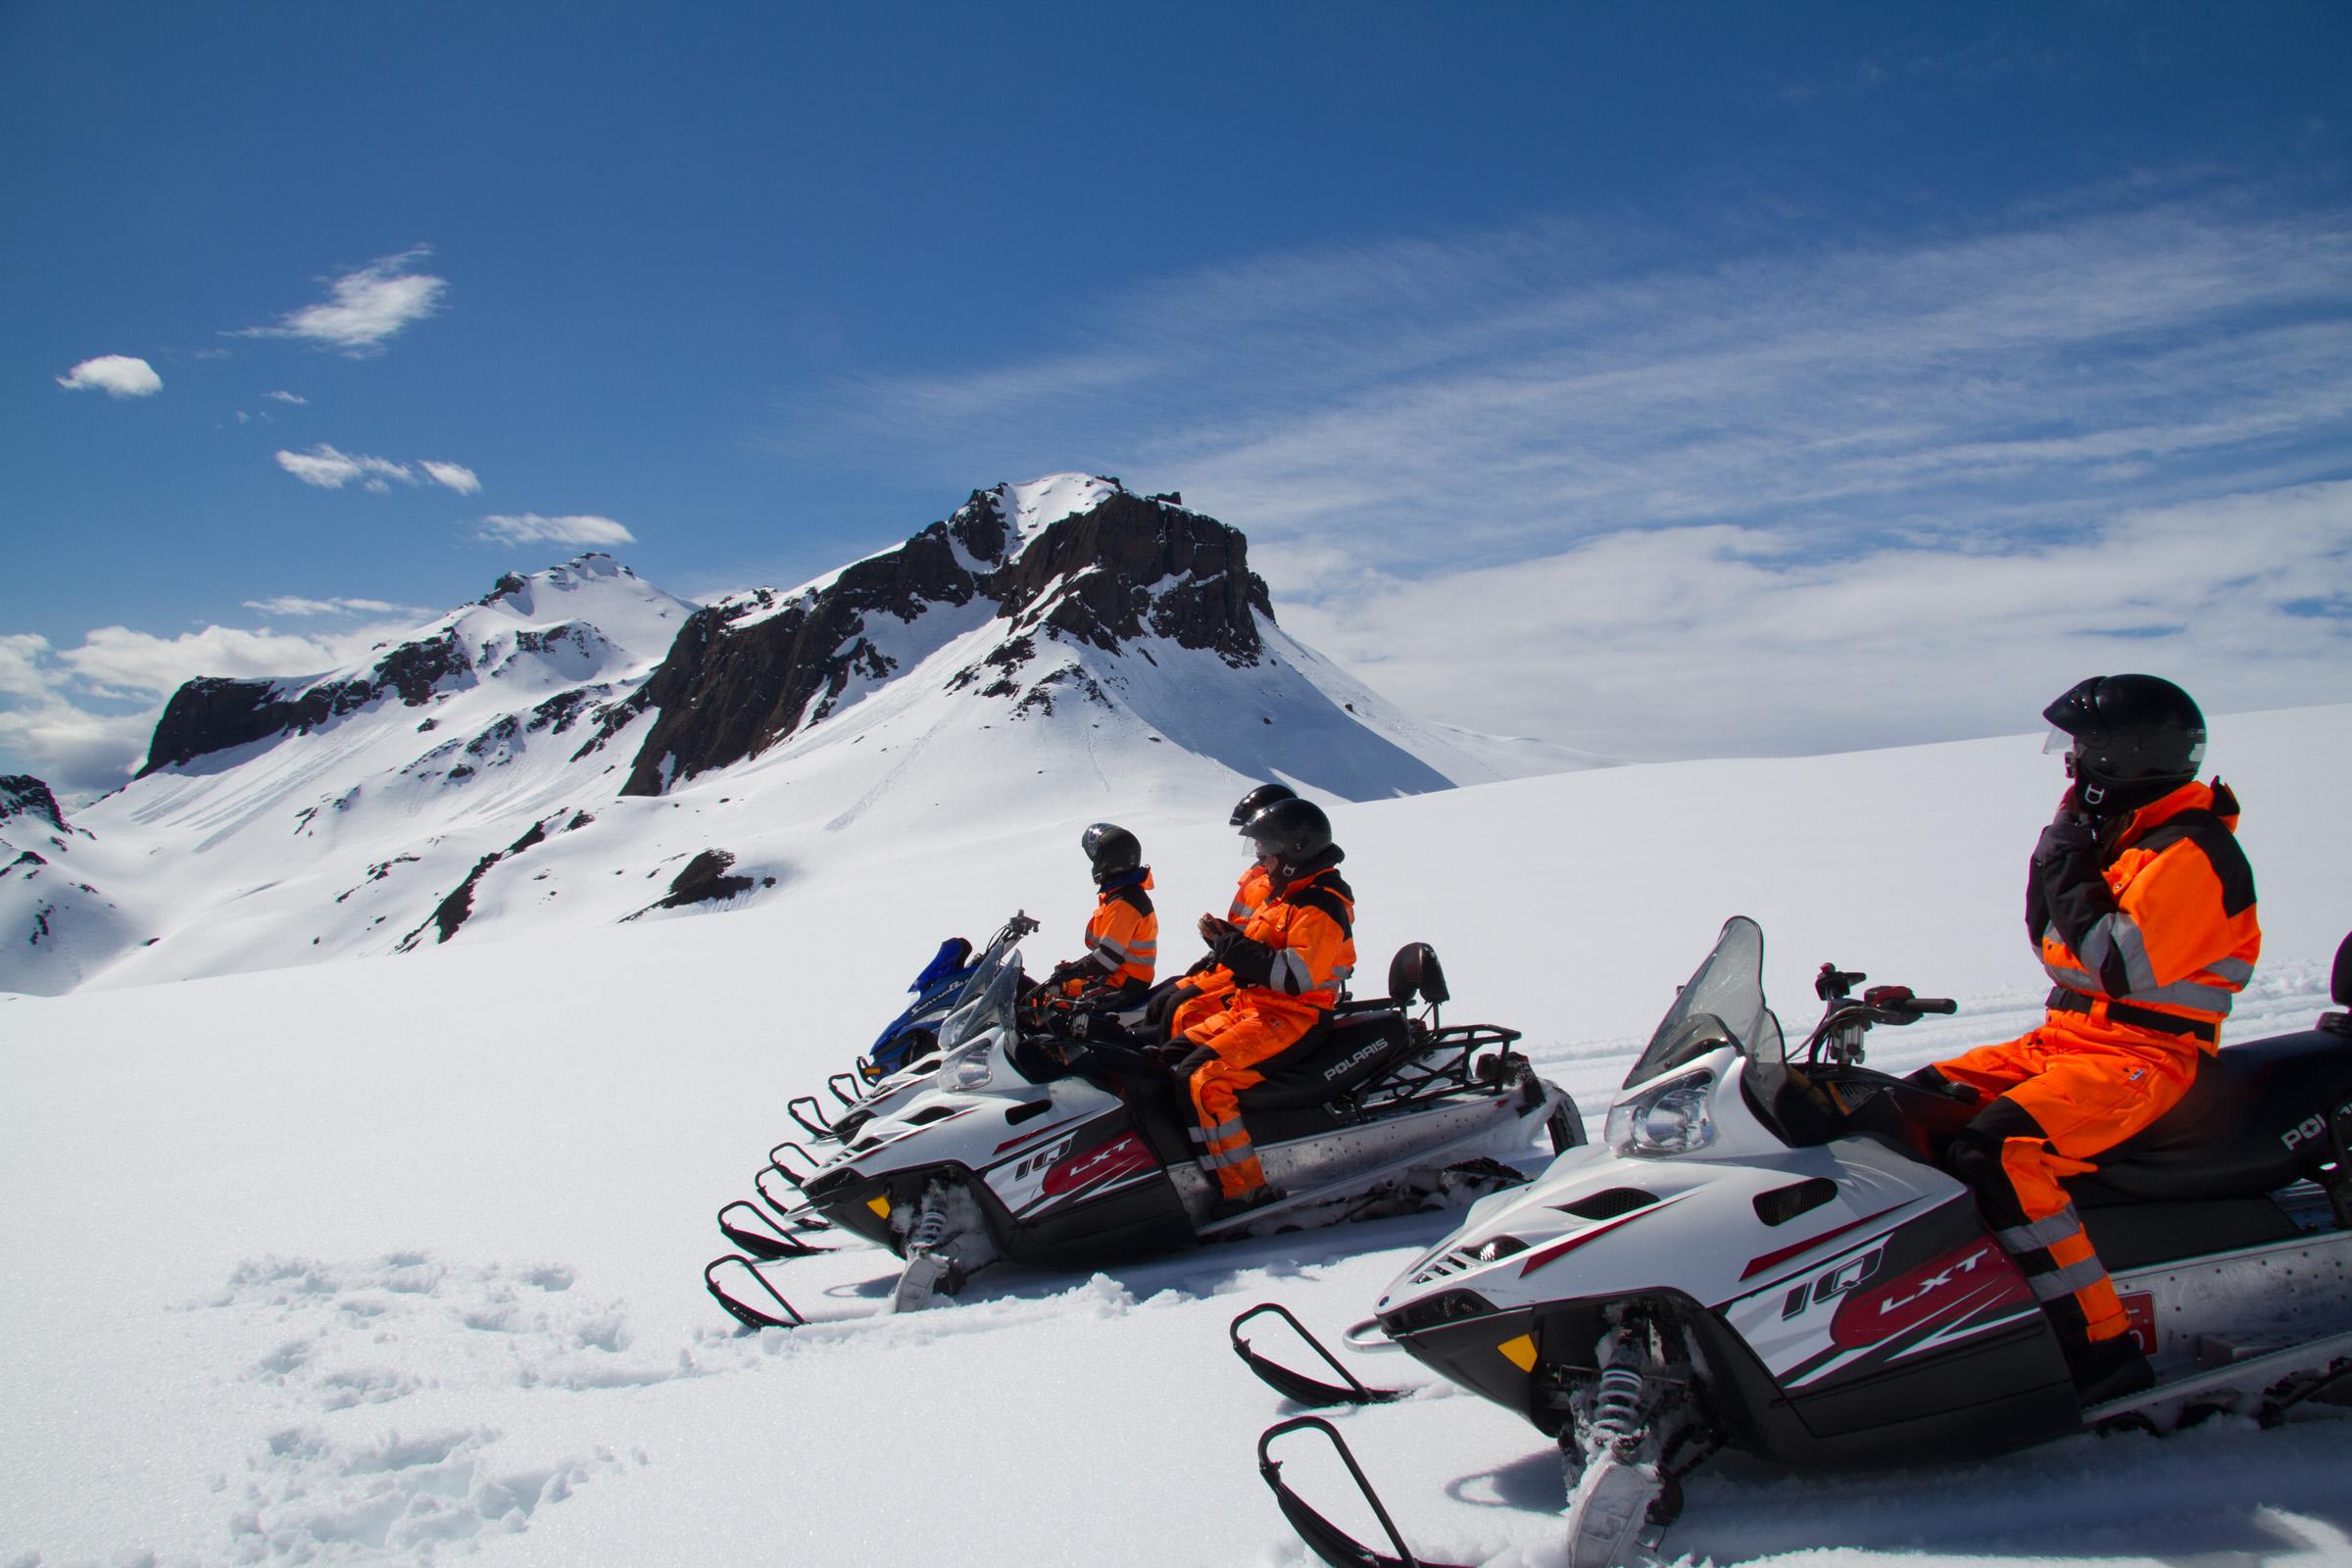 1 hour snowmobile tour on langjokull glacier from gullfoss waterfall